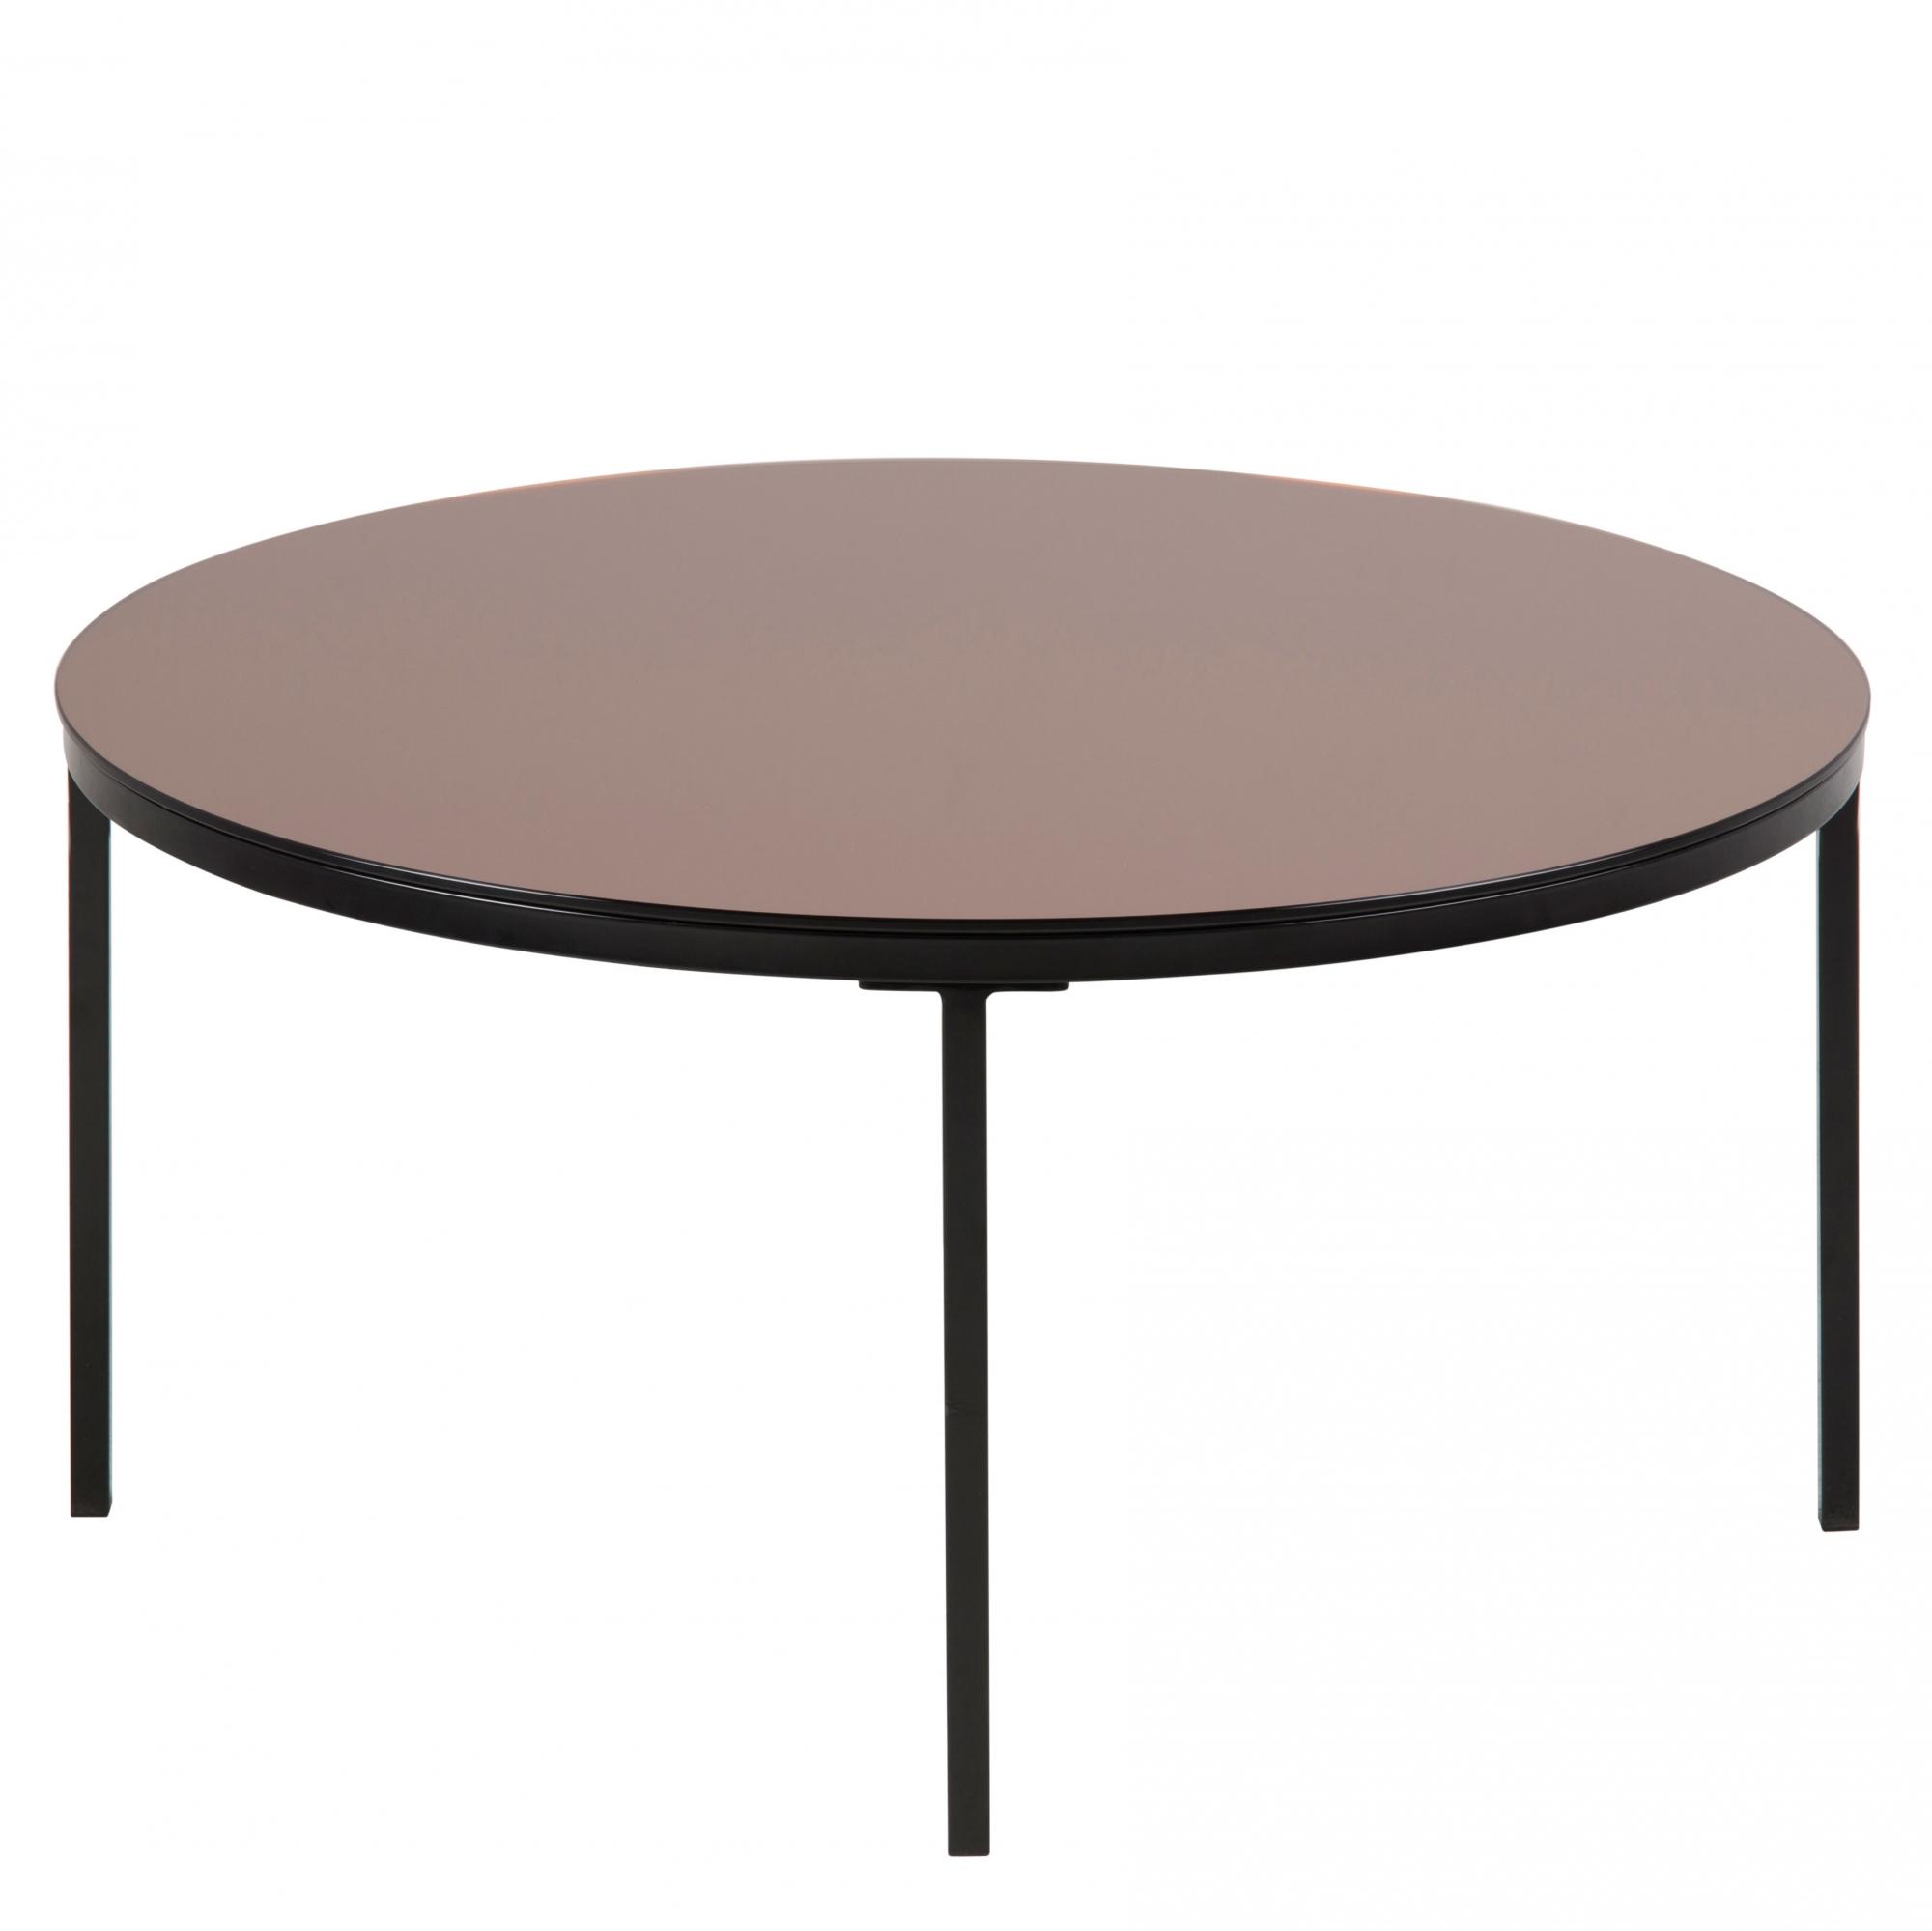 Konferenčný stolík sklenený Gira, 80 cm, bronzová